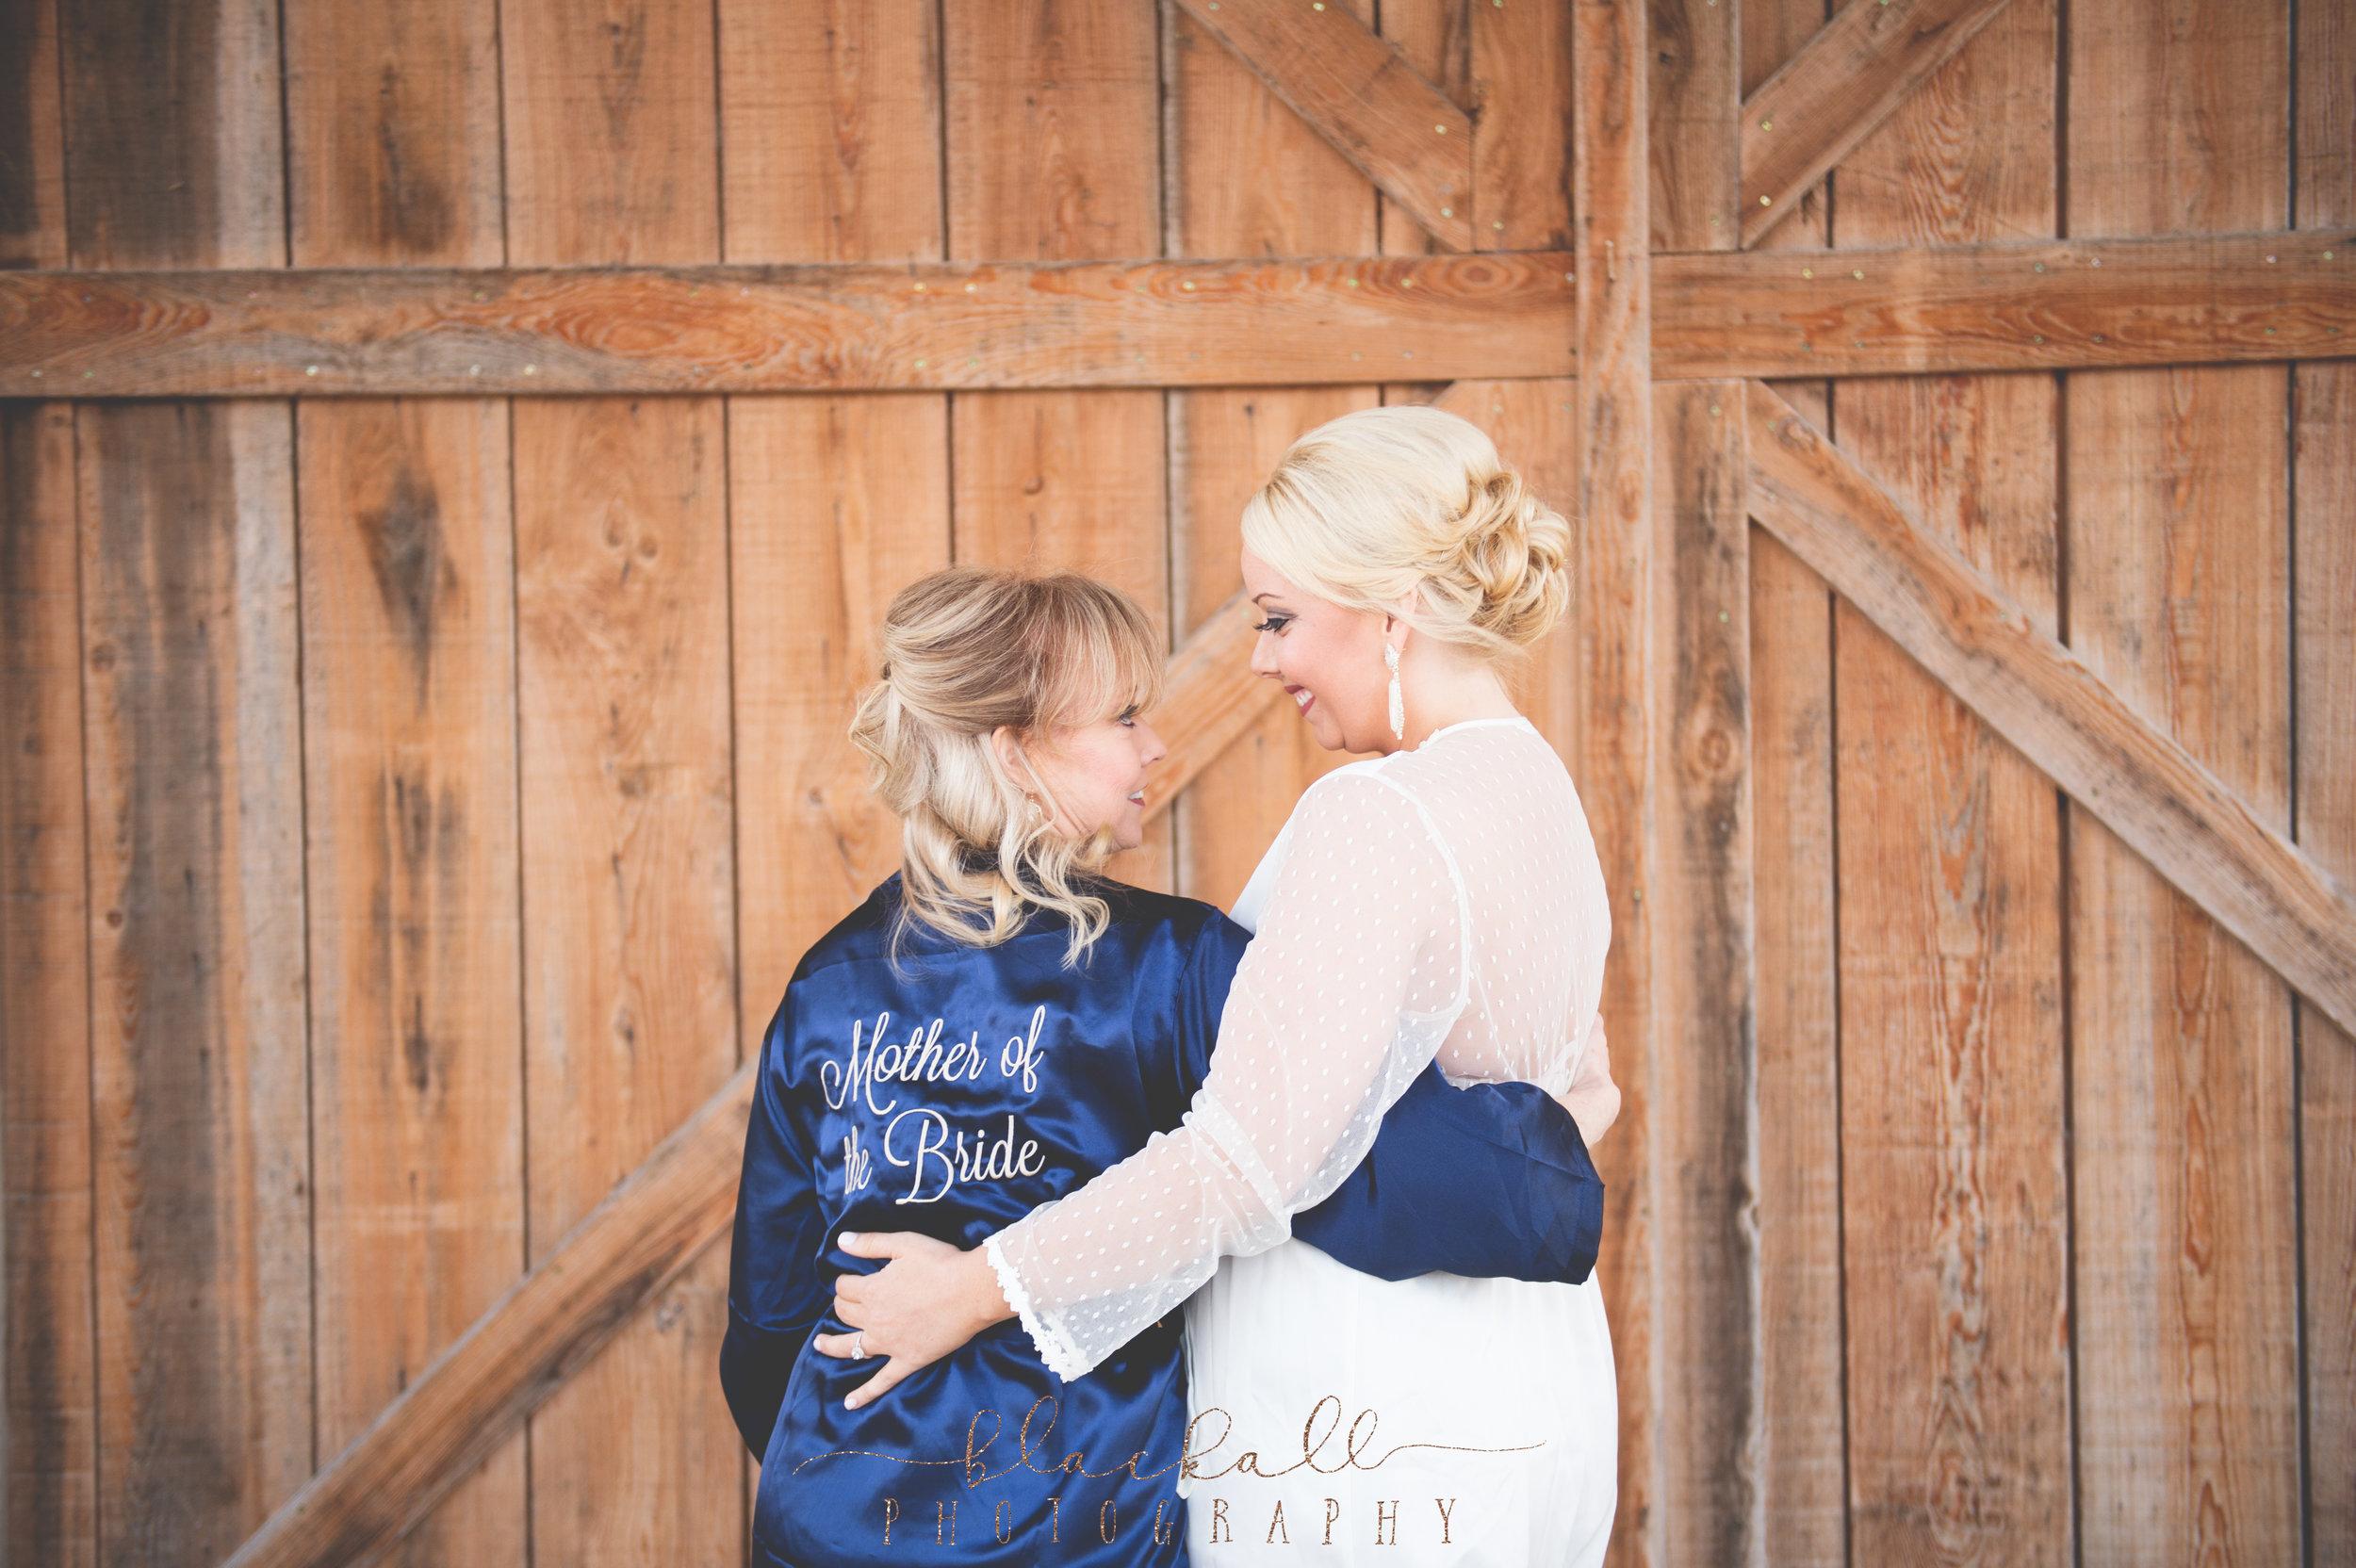 M&M WEDDING_Blackall Photography-19.JPG